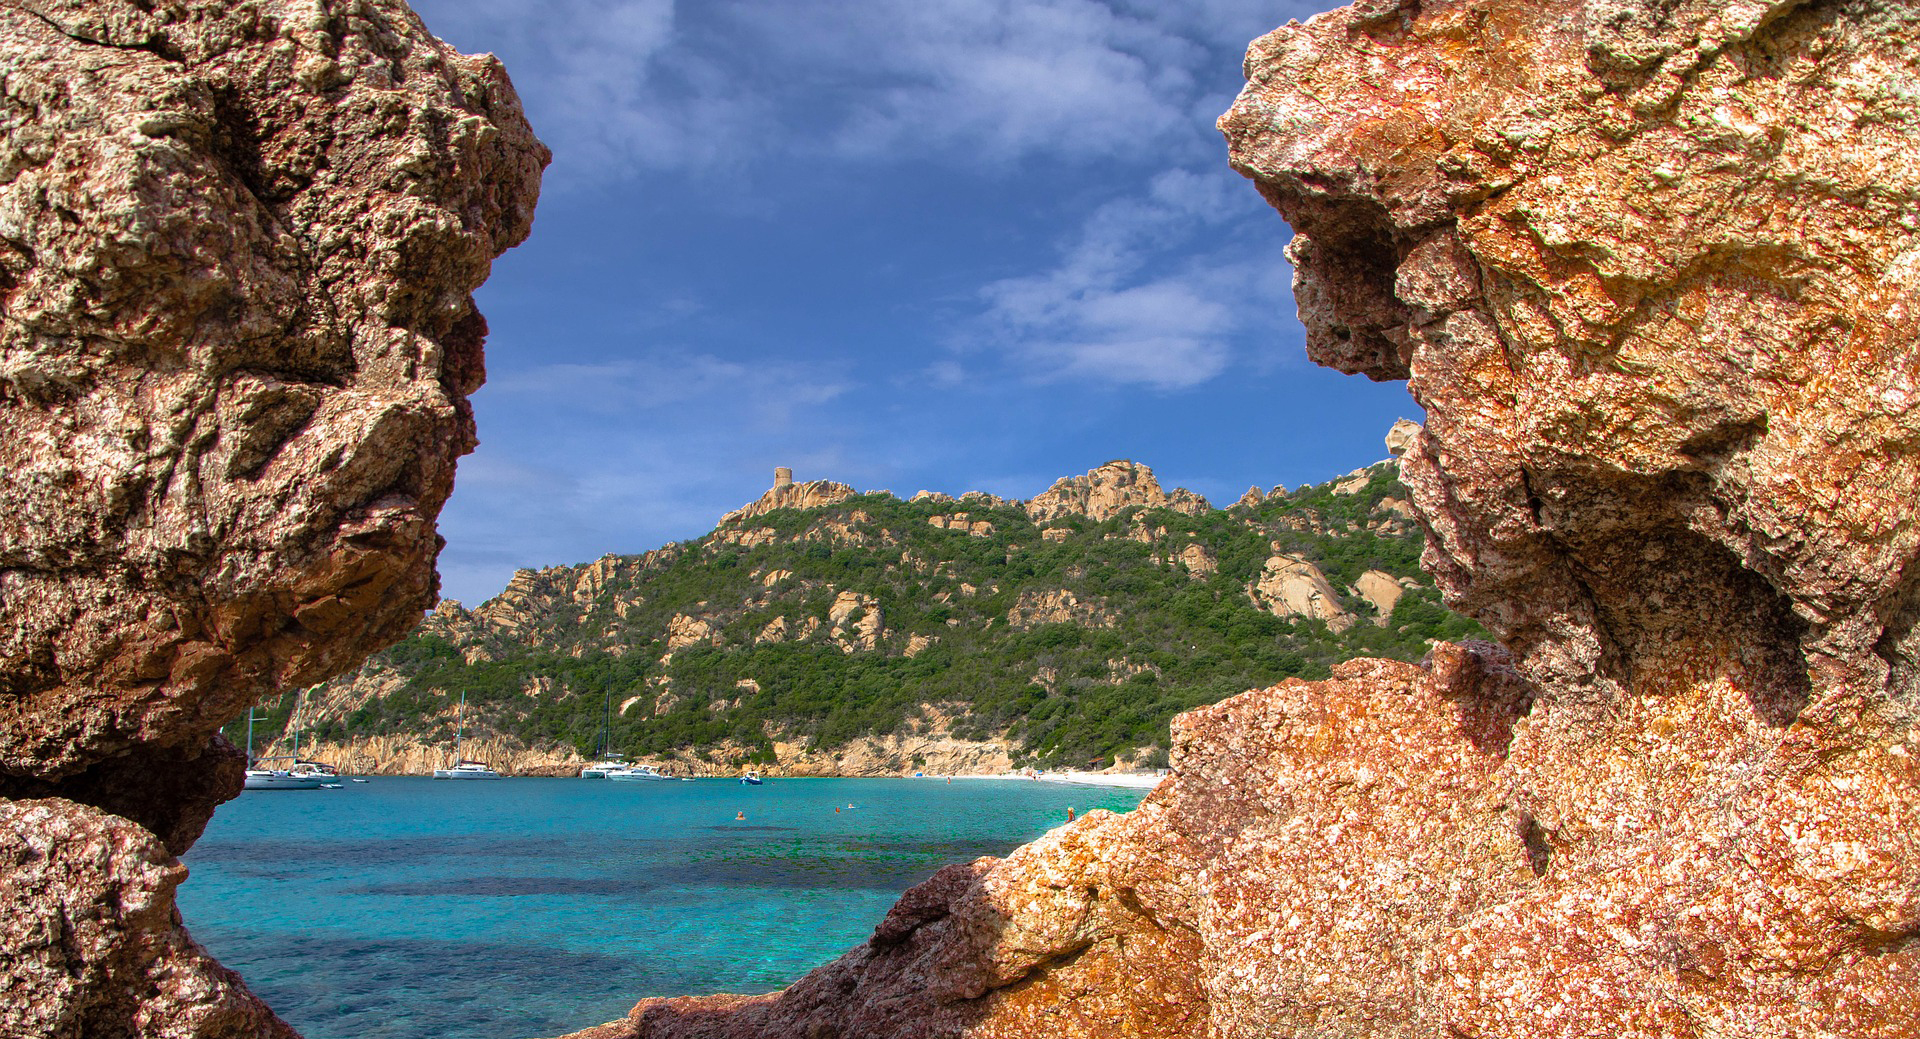 la Corse au printemps